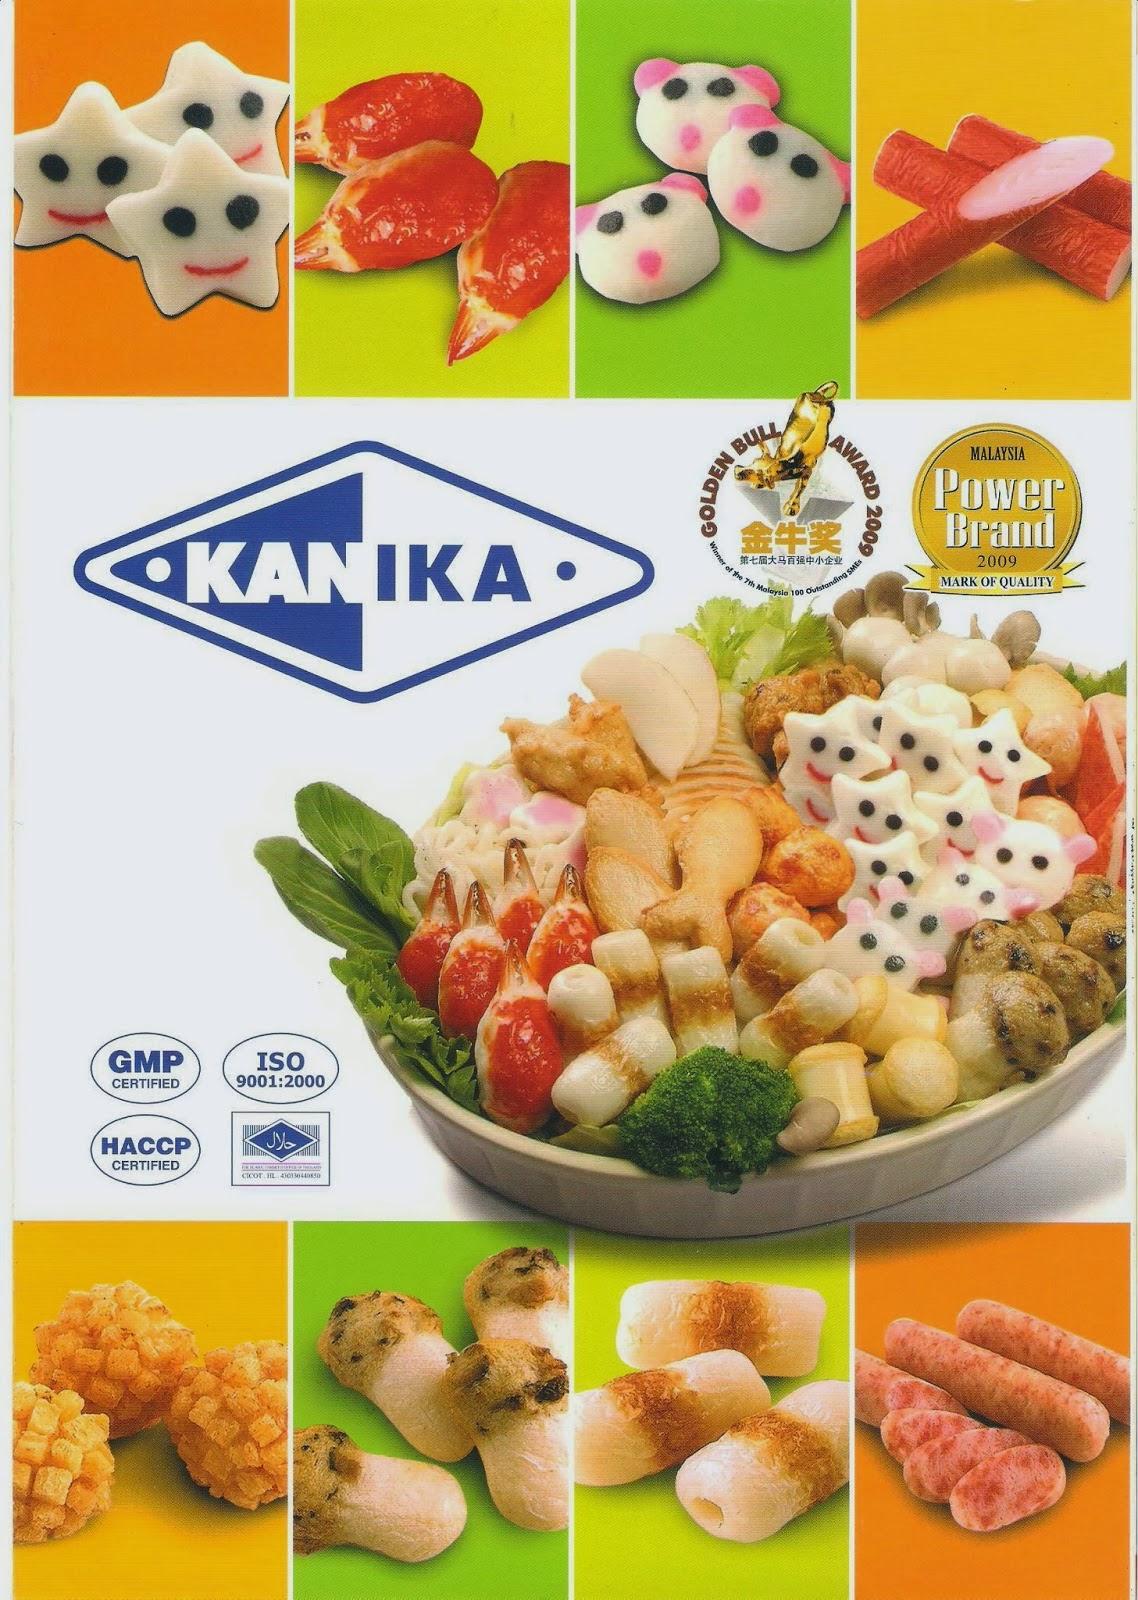 Goodwin Food Belfood Belfoods Favorite Chicken Nugget Ceria Kanika Steamboat